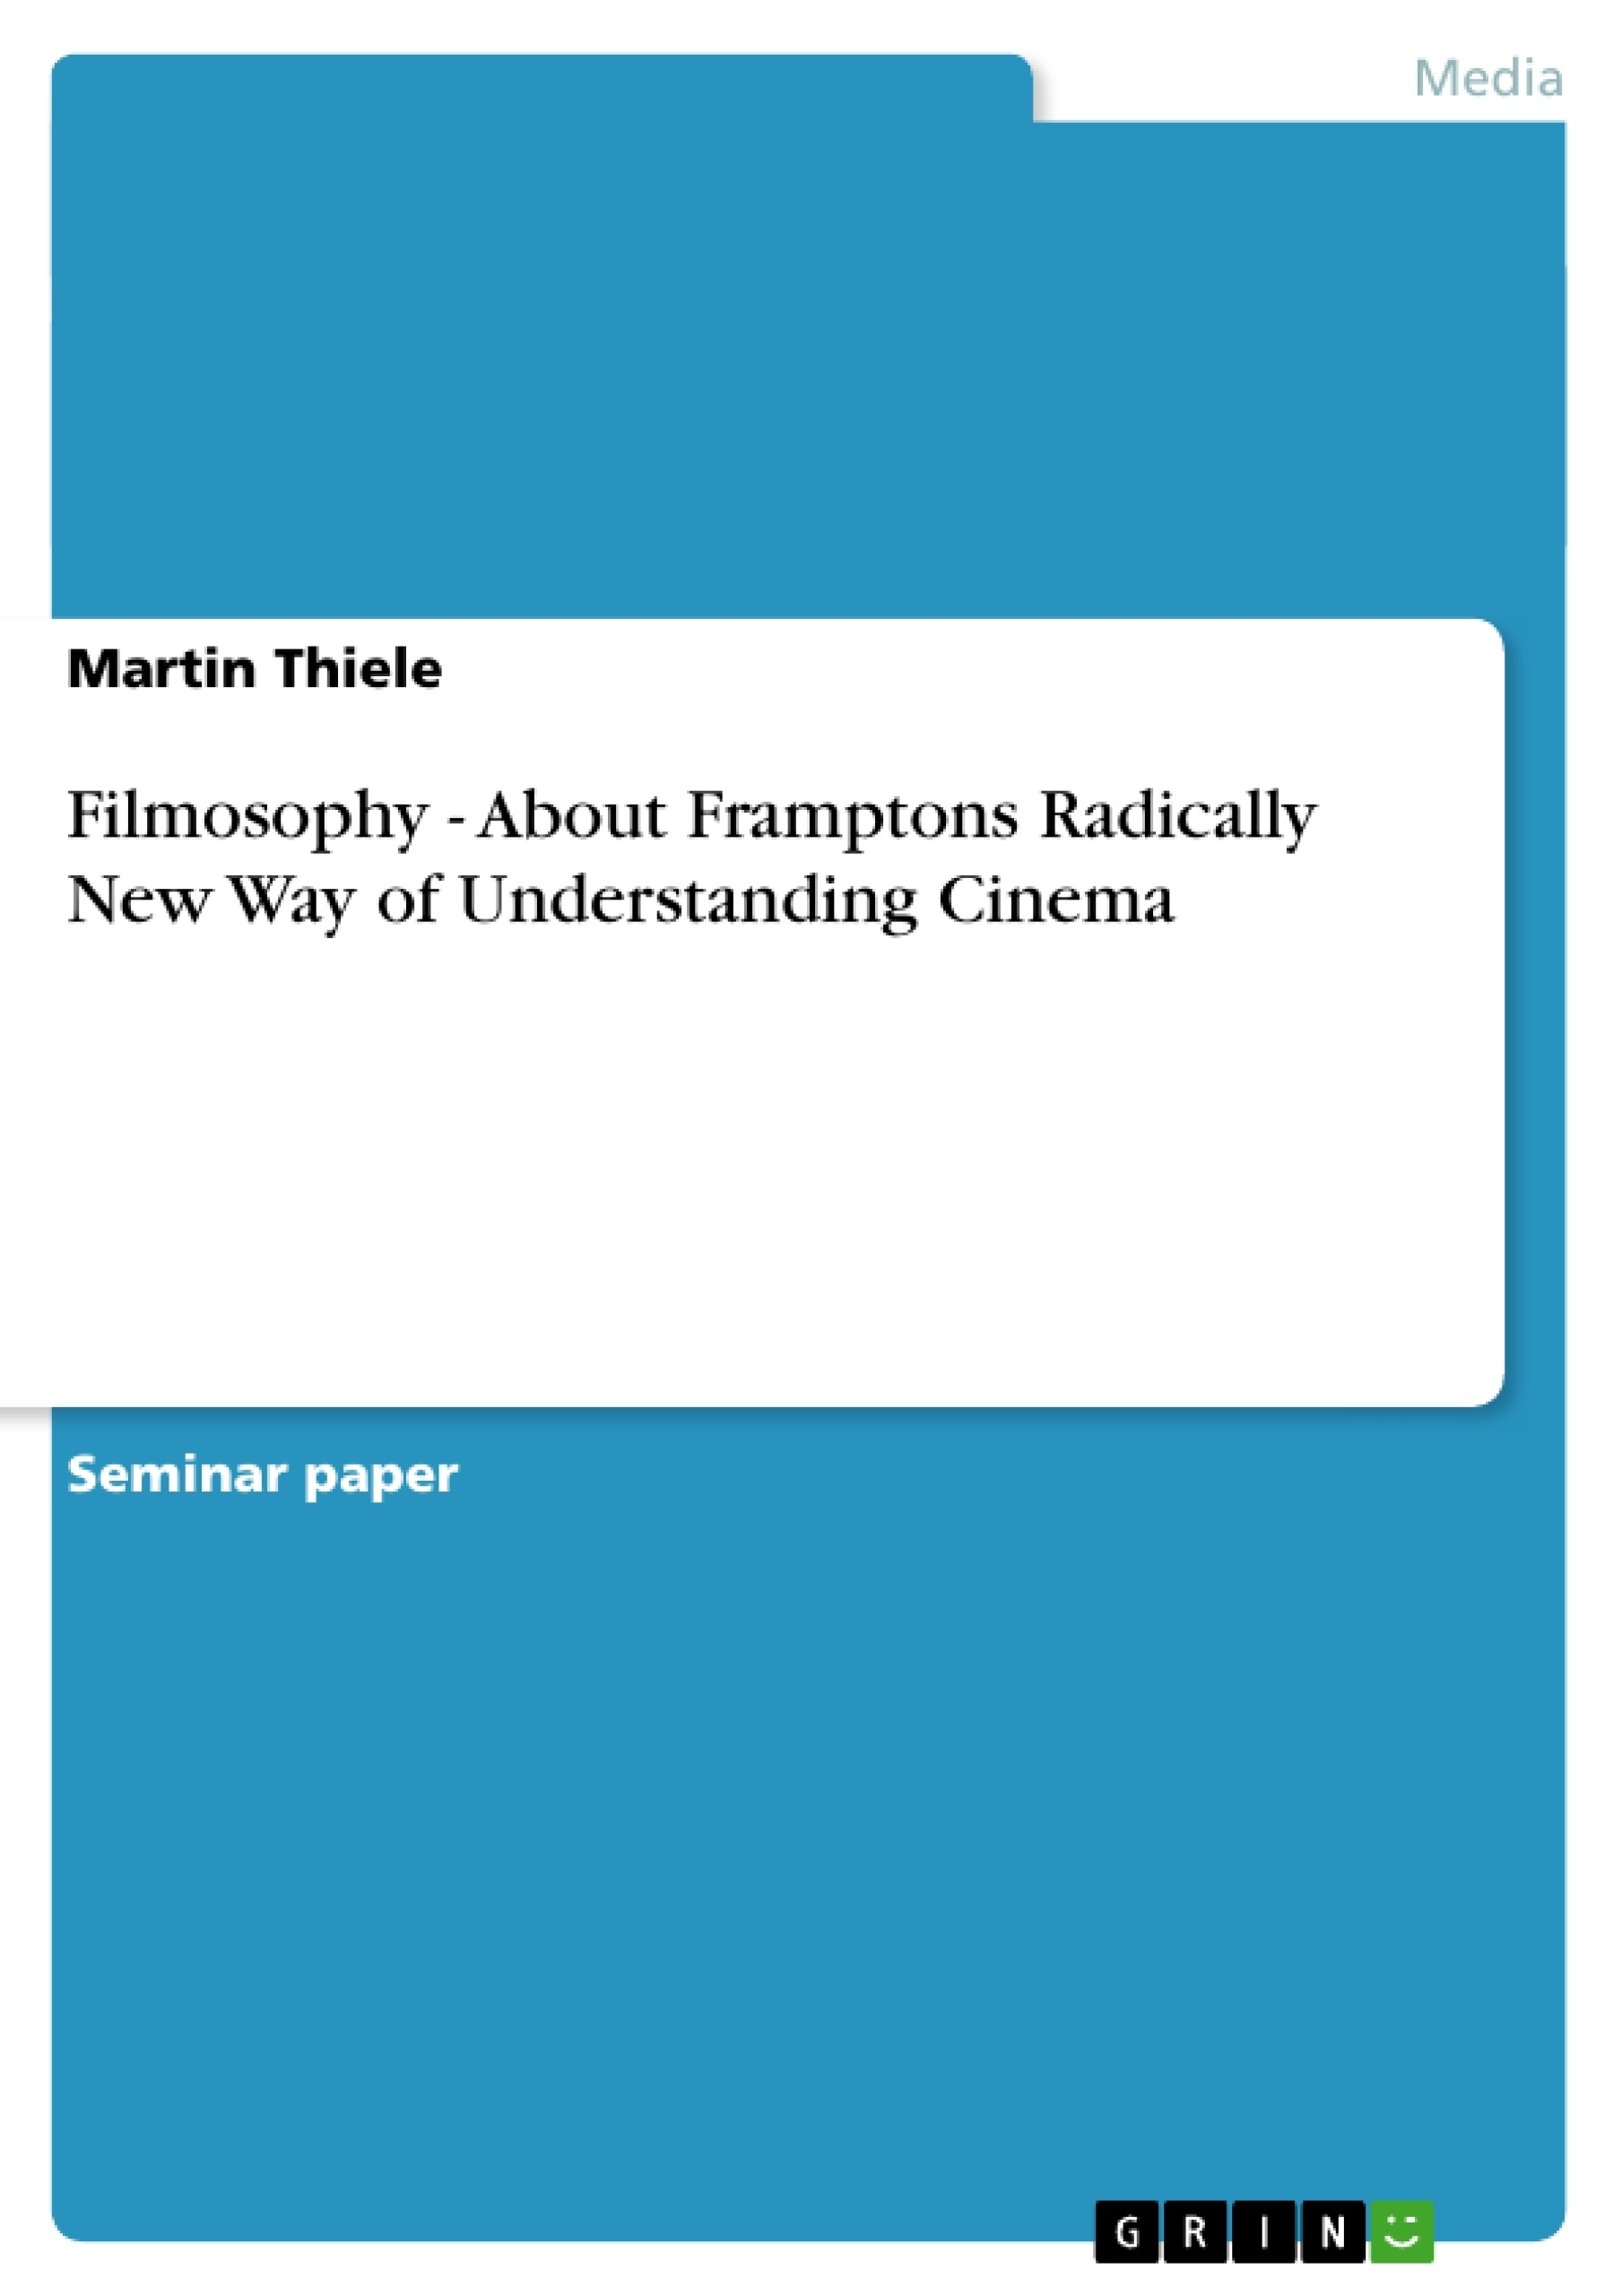 Title: Filmosophy - About Framptons Radically New Way of Understanding Cinema